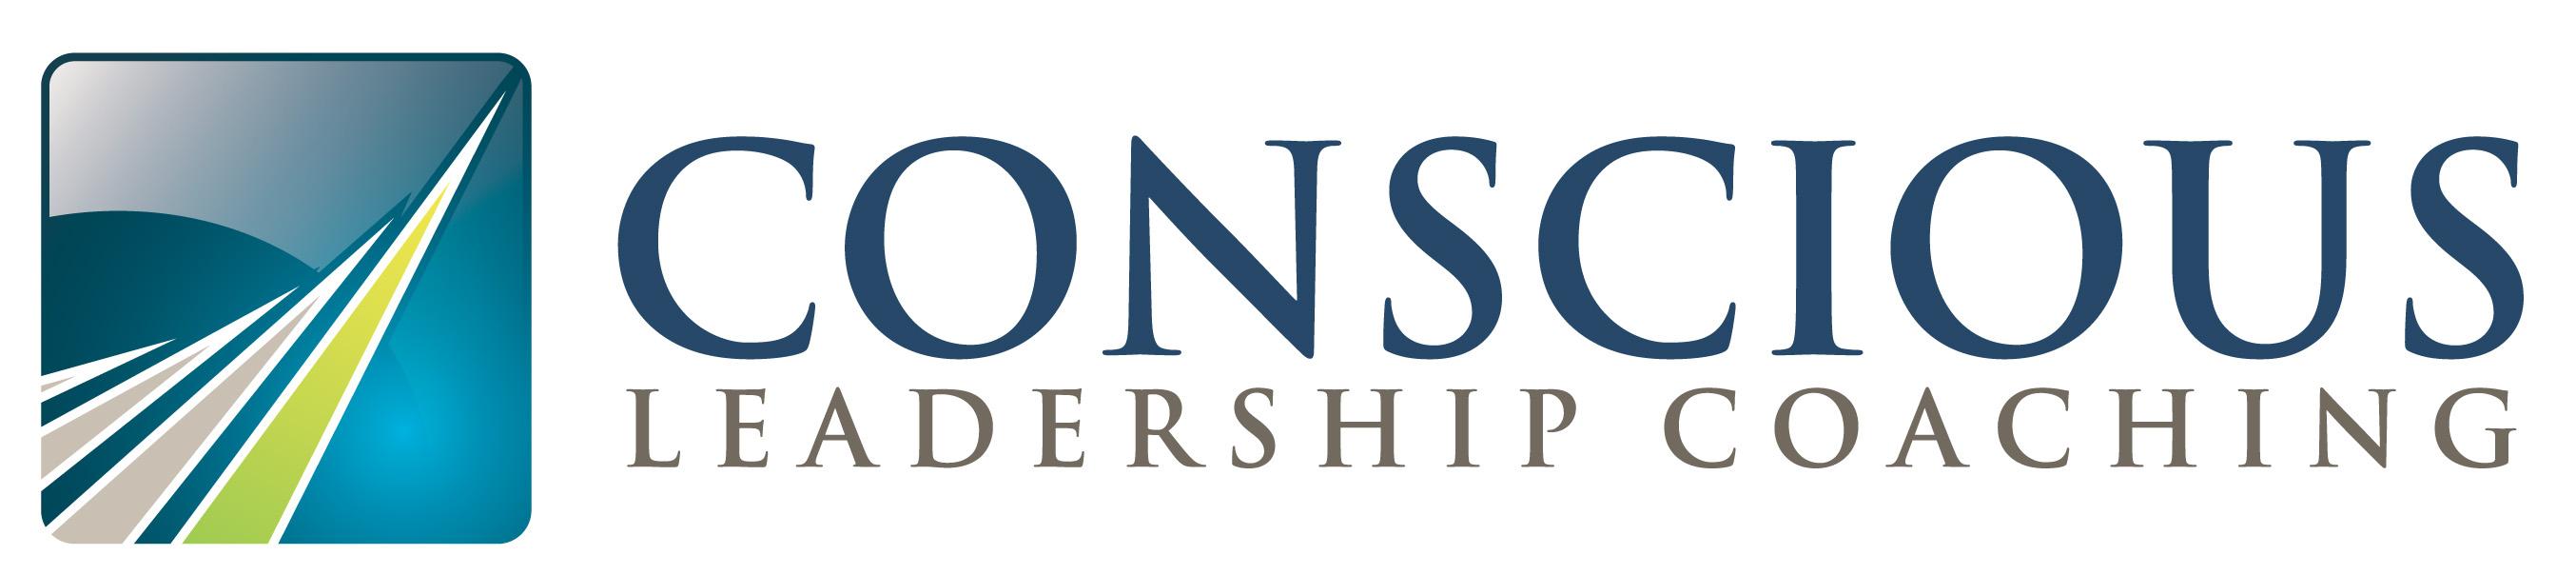 CLC - Conscious Leadership Coaching